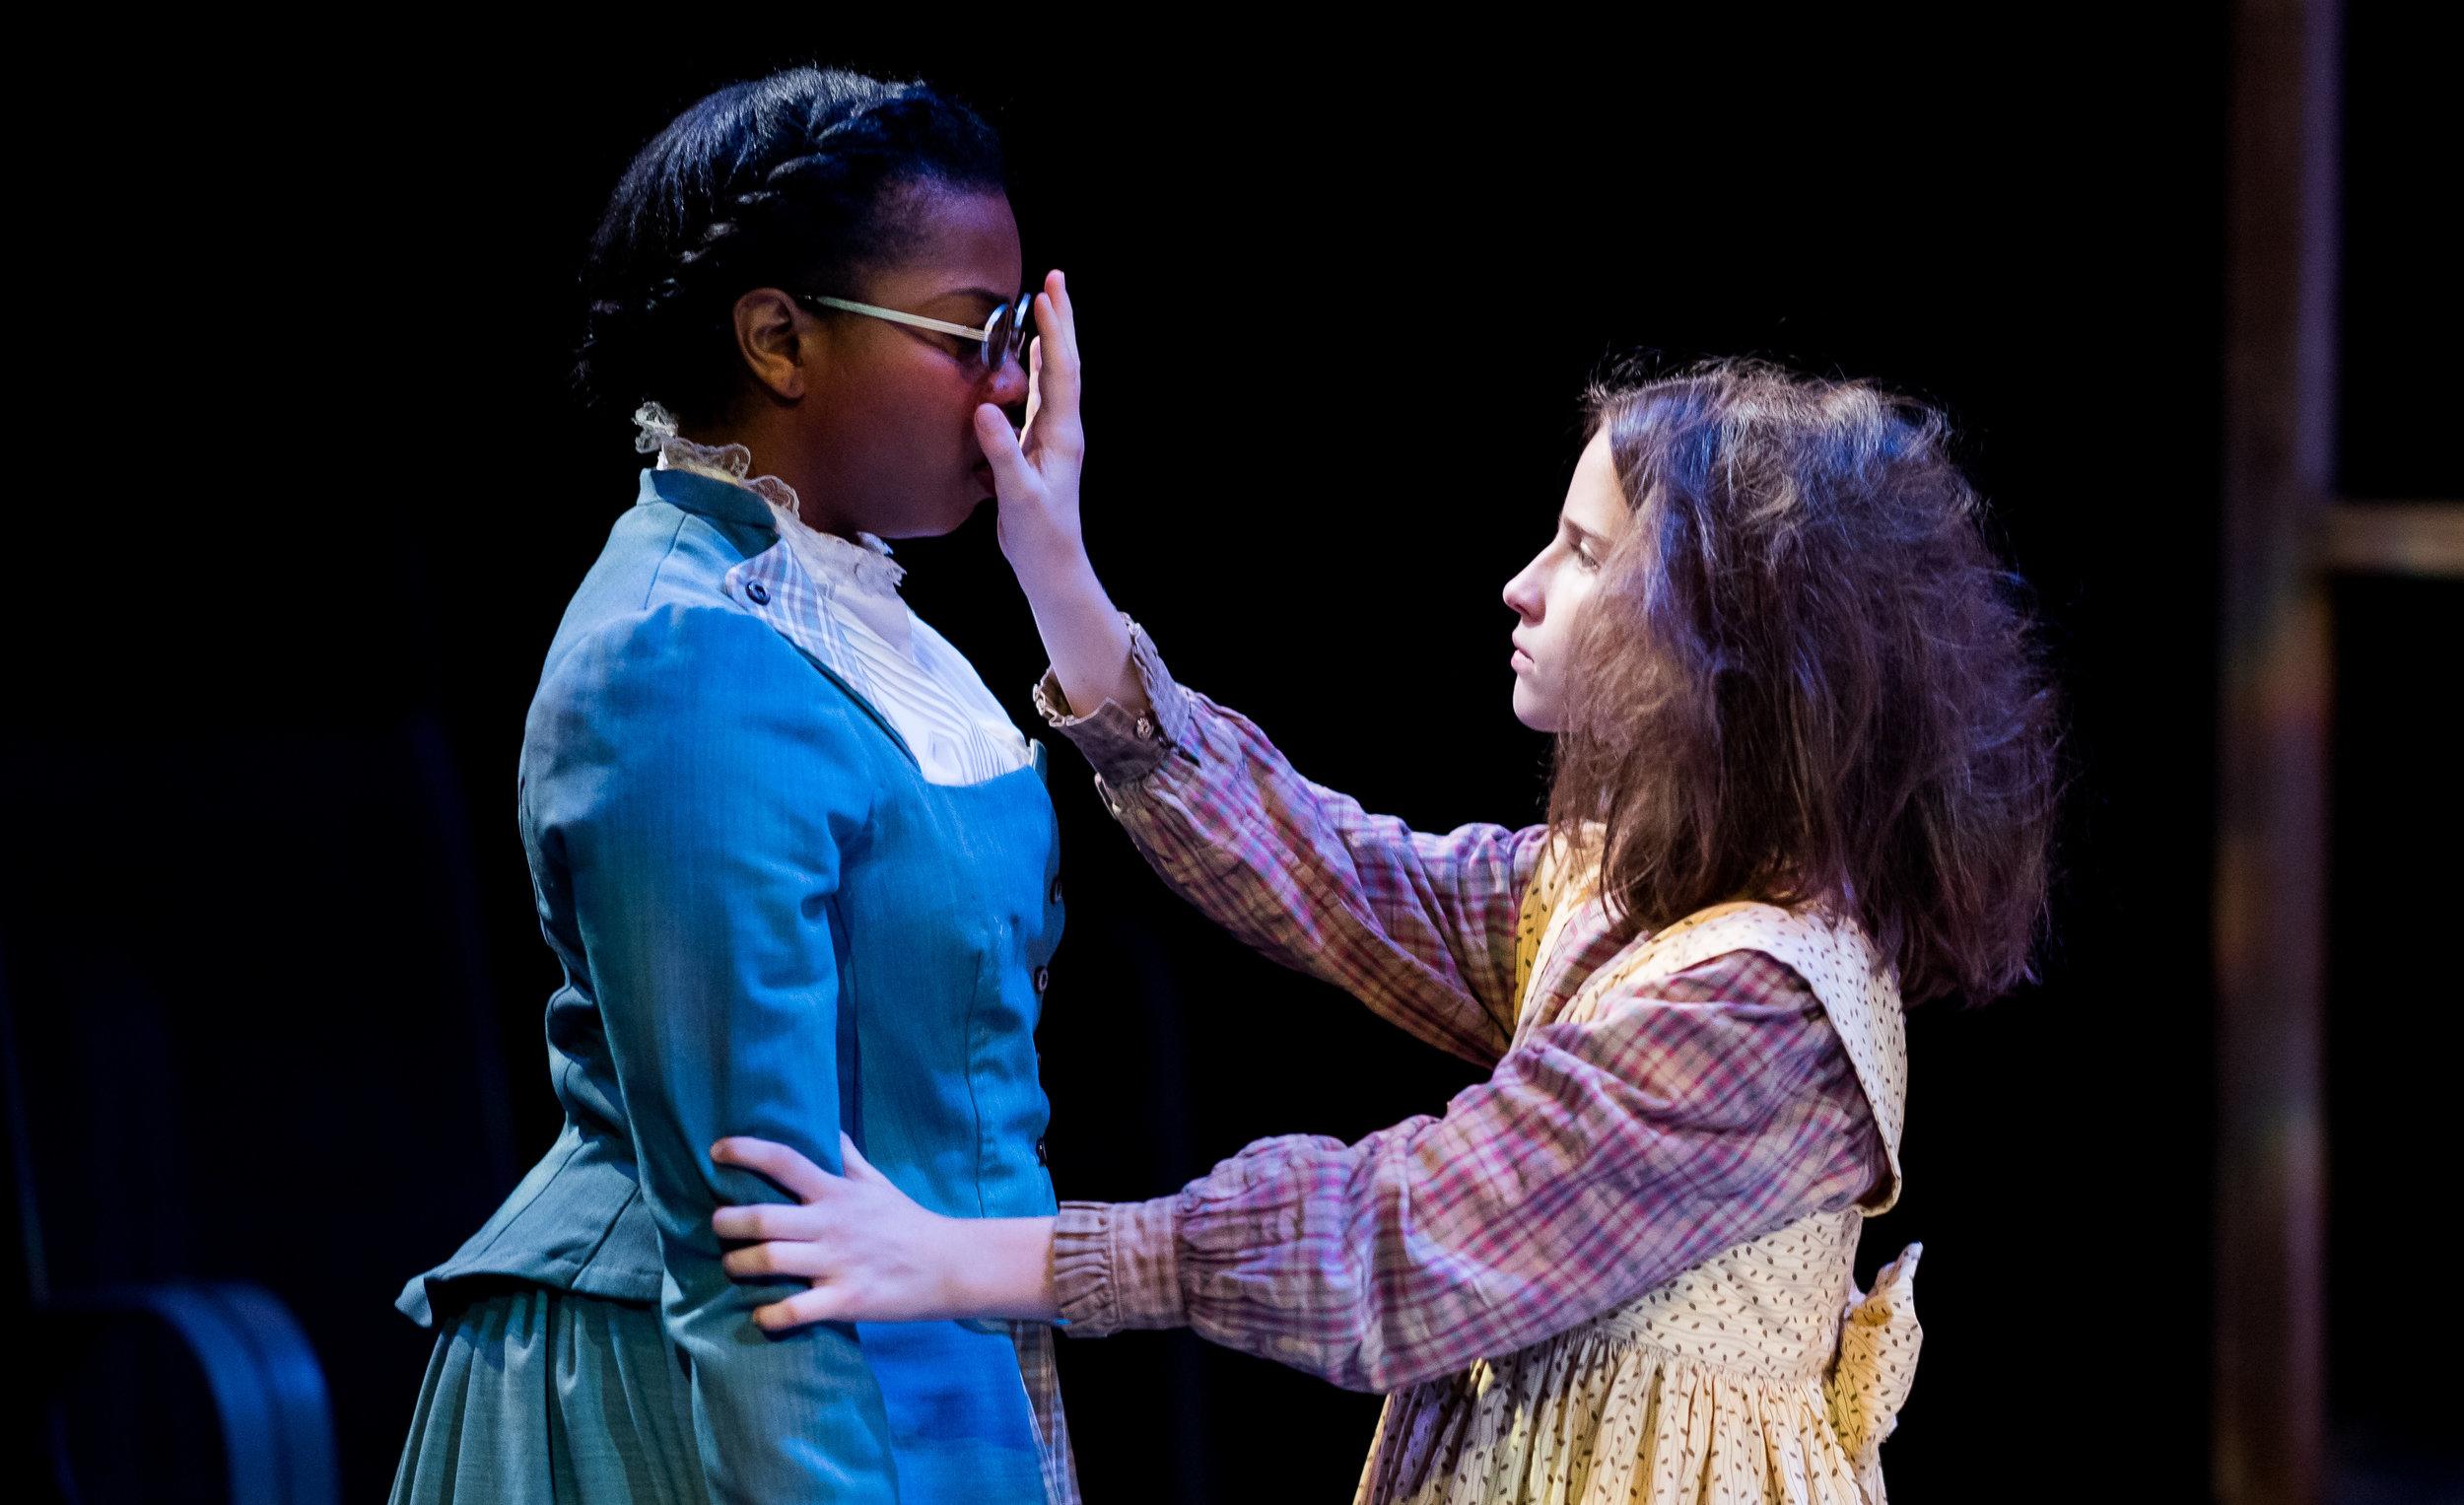 129-Yellow Tree Theatre-Miracle Worker-Helen Keller-Osseo-Minneapolis-community-photography-September 11, 2018-www.jcoxphotography.com.jpg